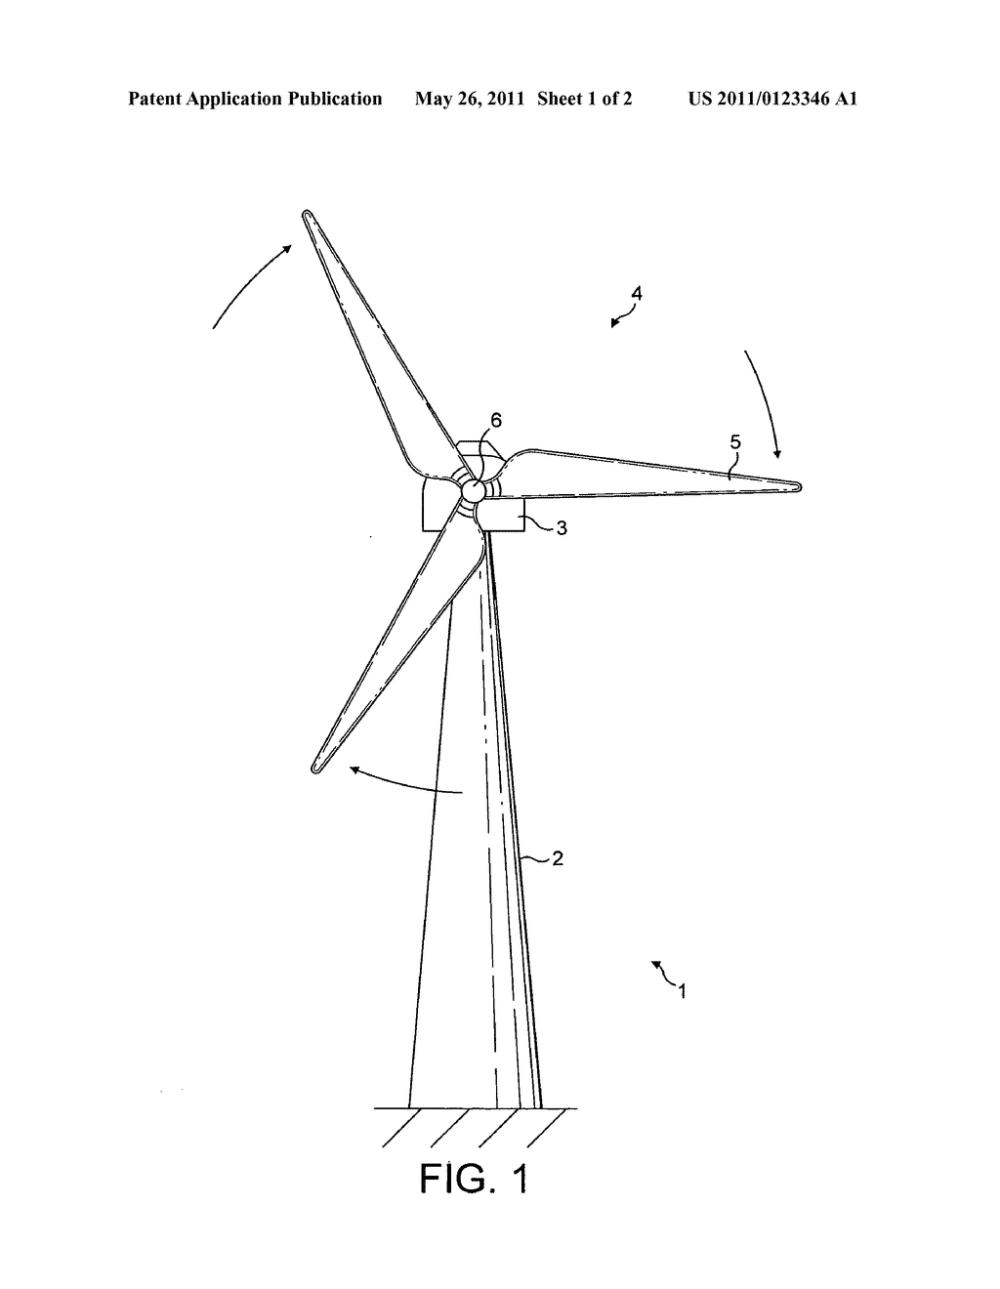 medium resolution of wind turbine blade diagram schematic and image 02 diagram of wind turbine blades